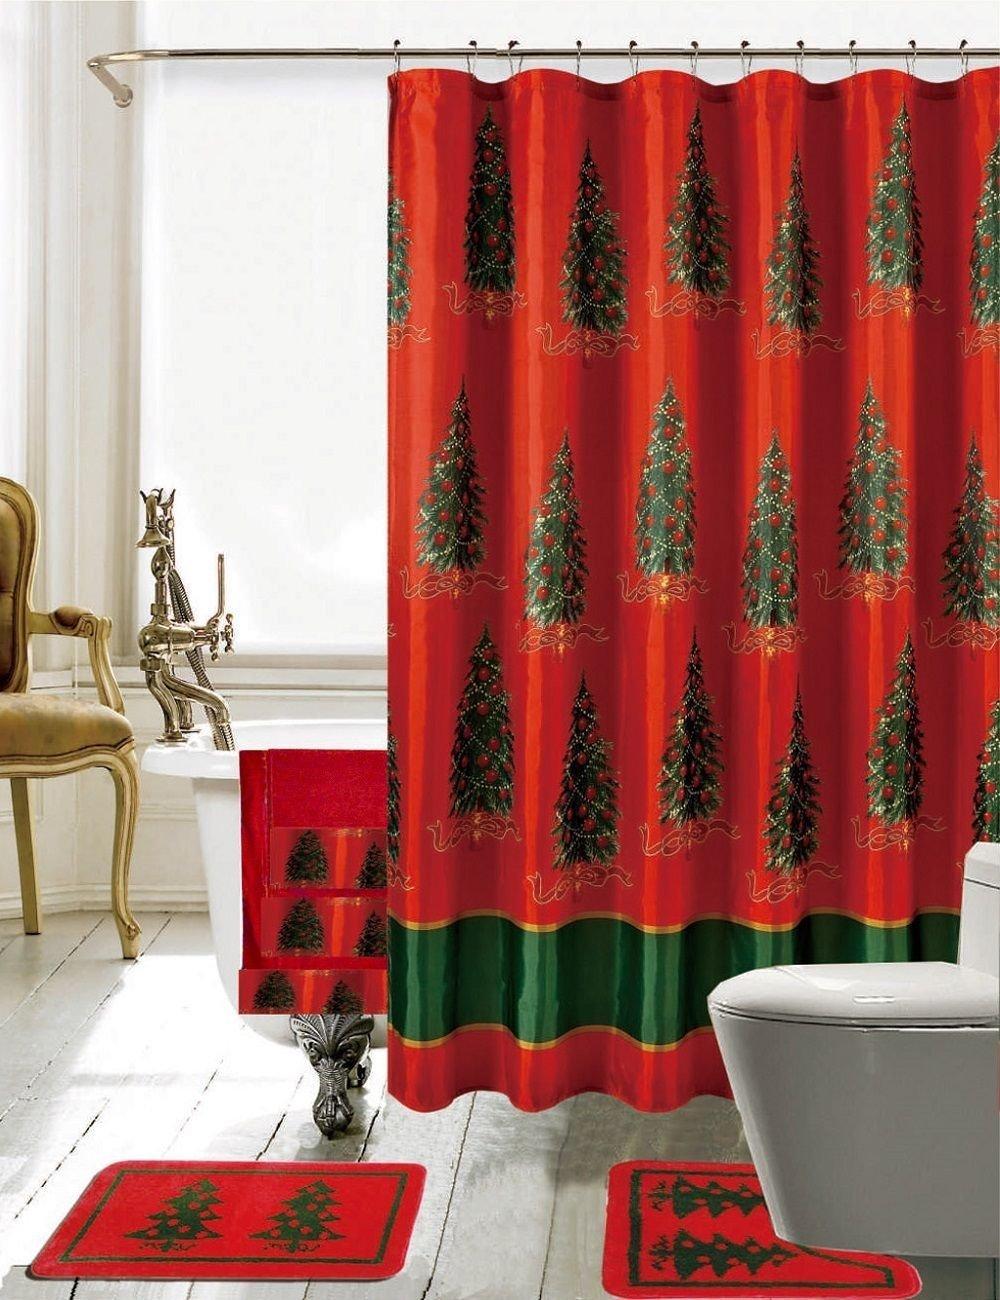 Buy 18 Pc Christmas Bathroom Set Shower Curtain 12 Rings